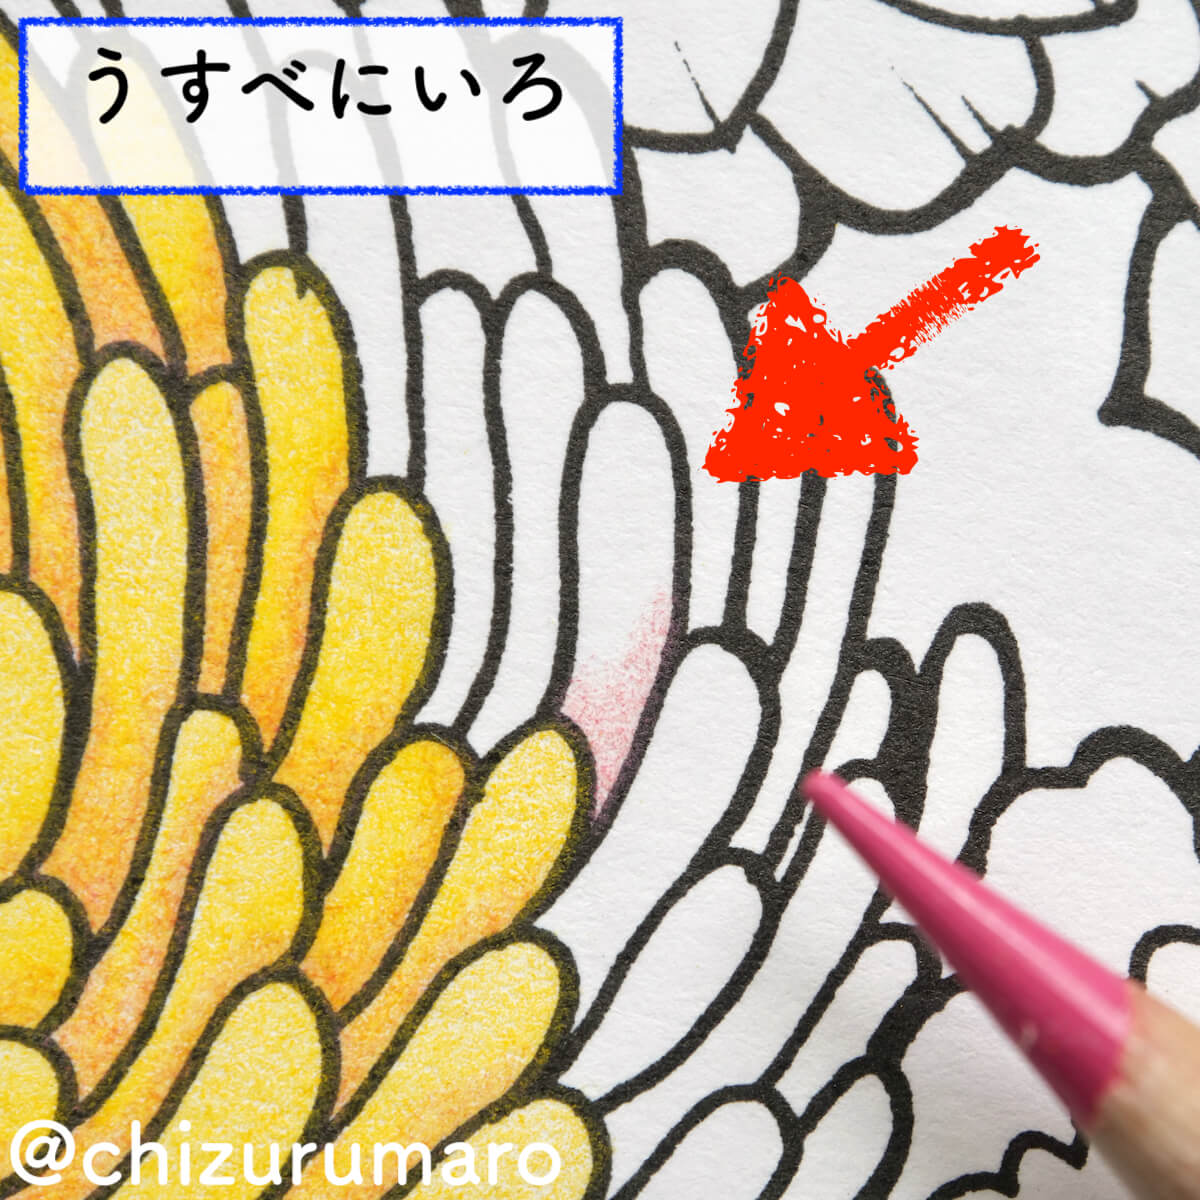 f:id:chizurumaro:20200930151646j:plain